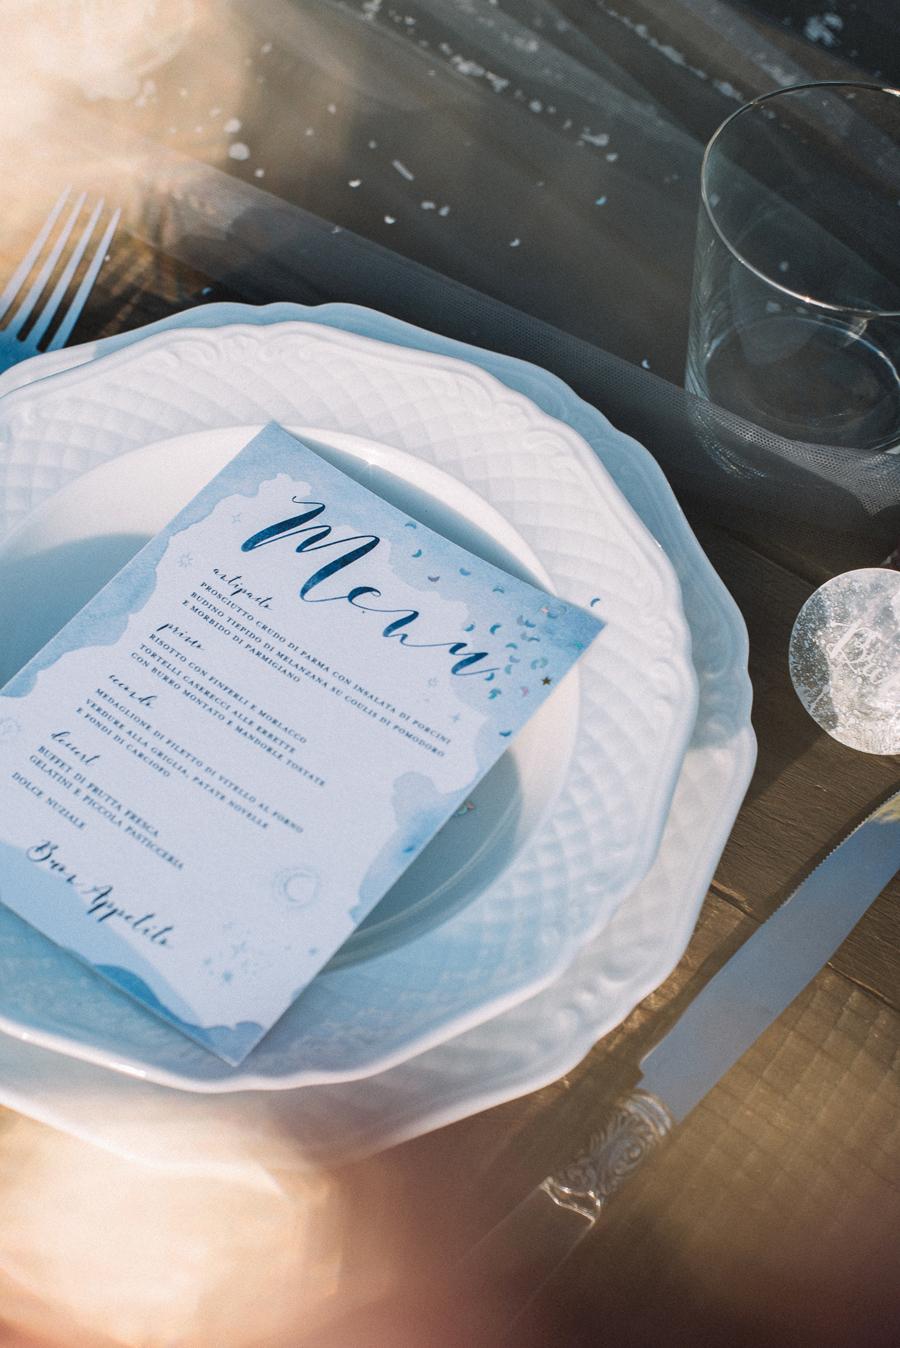 menù bianco e azzurro